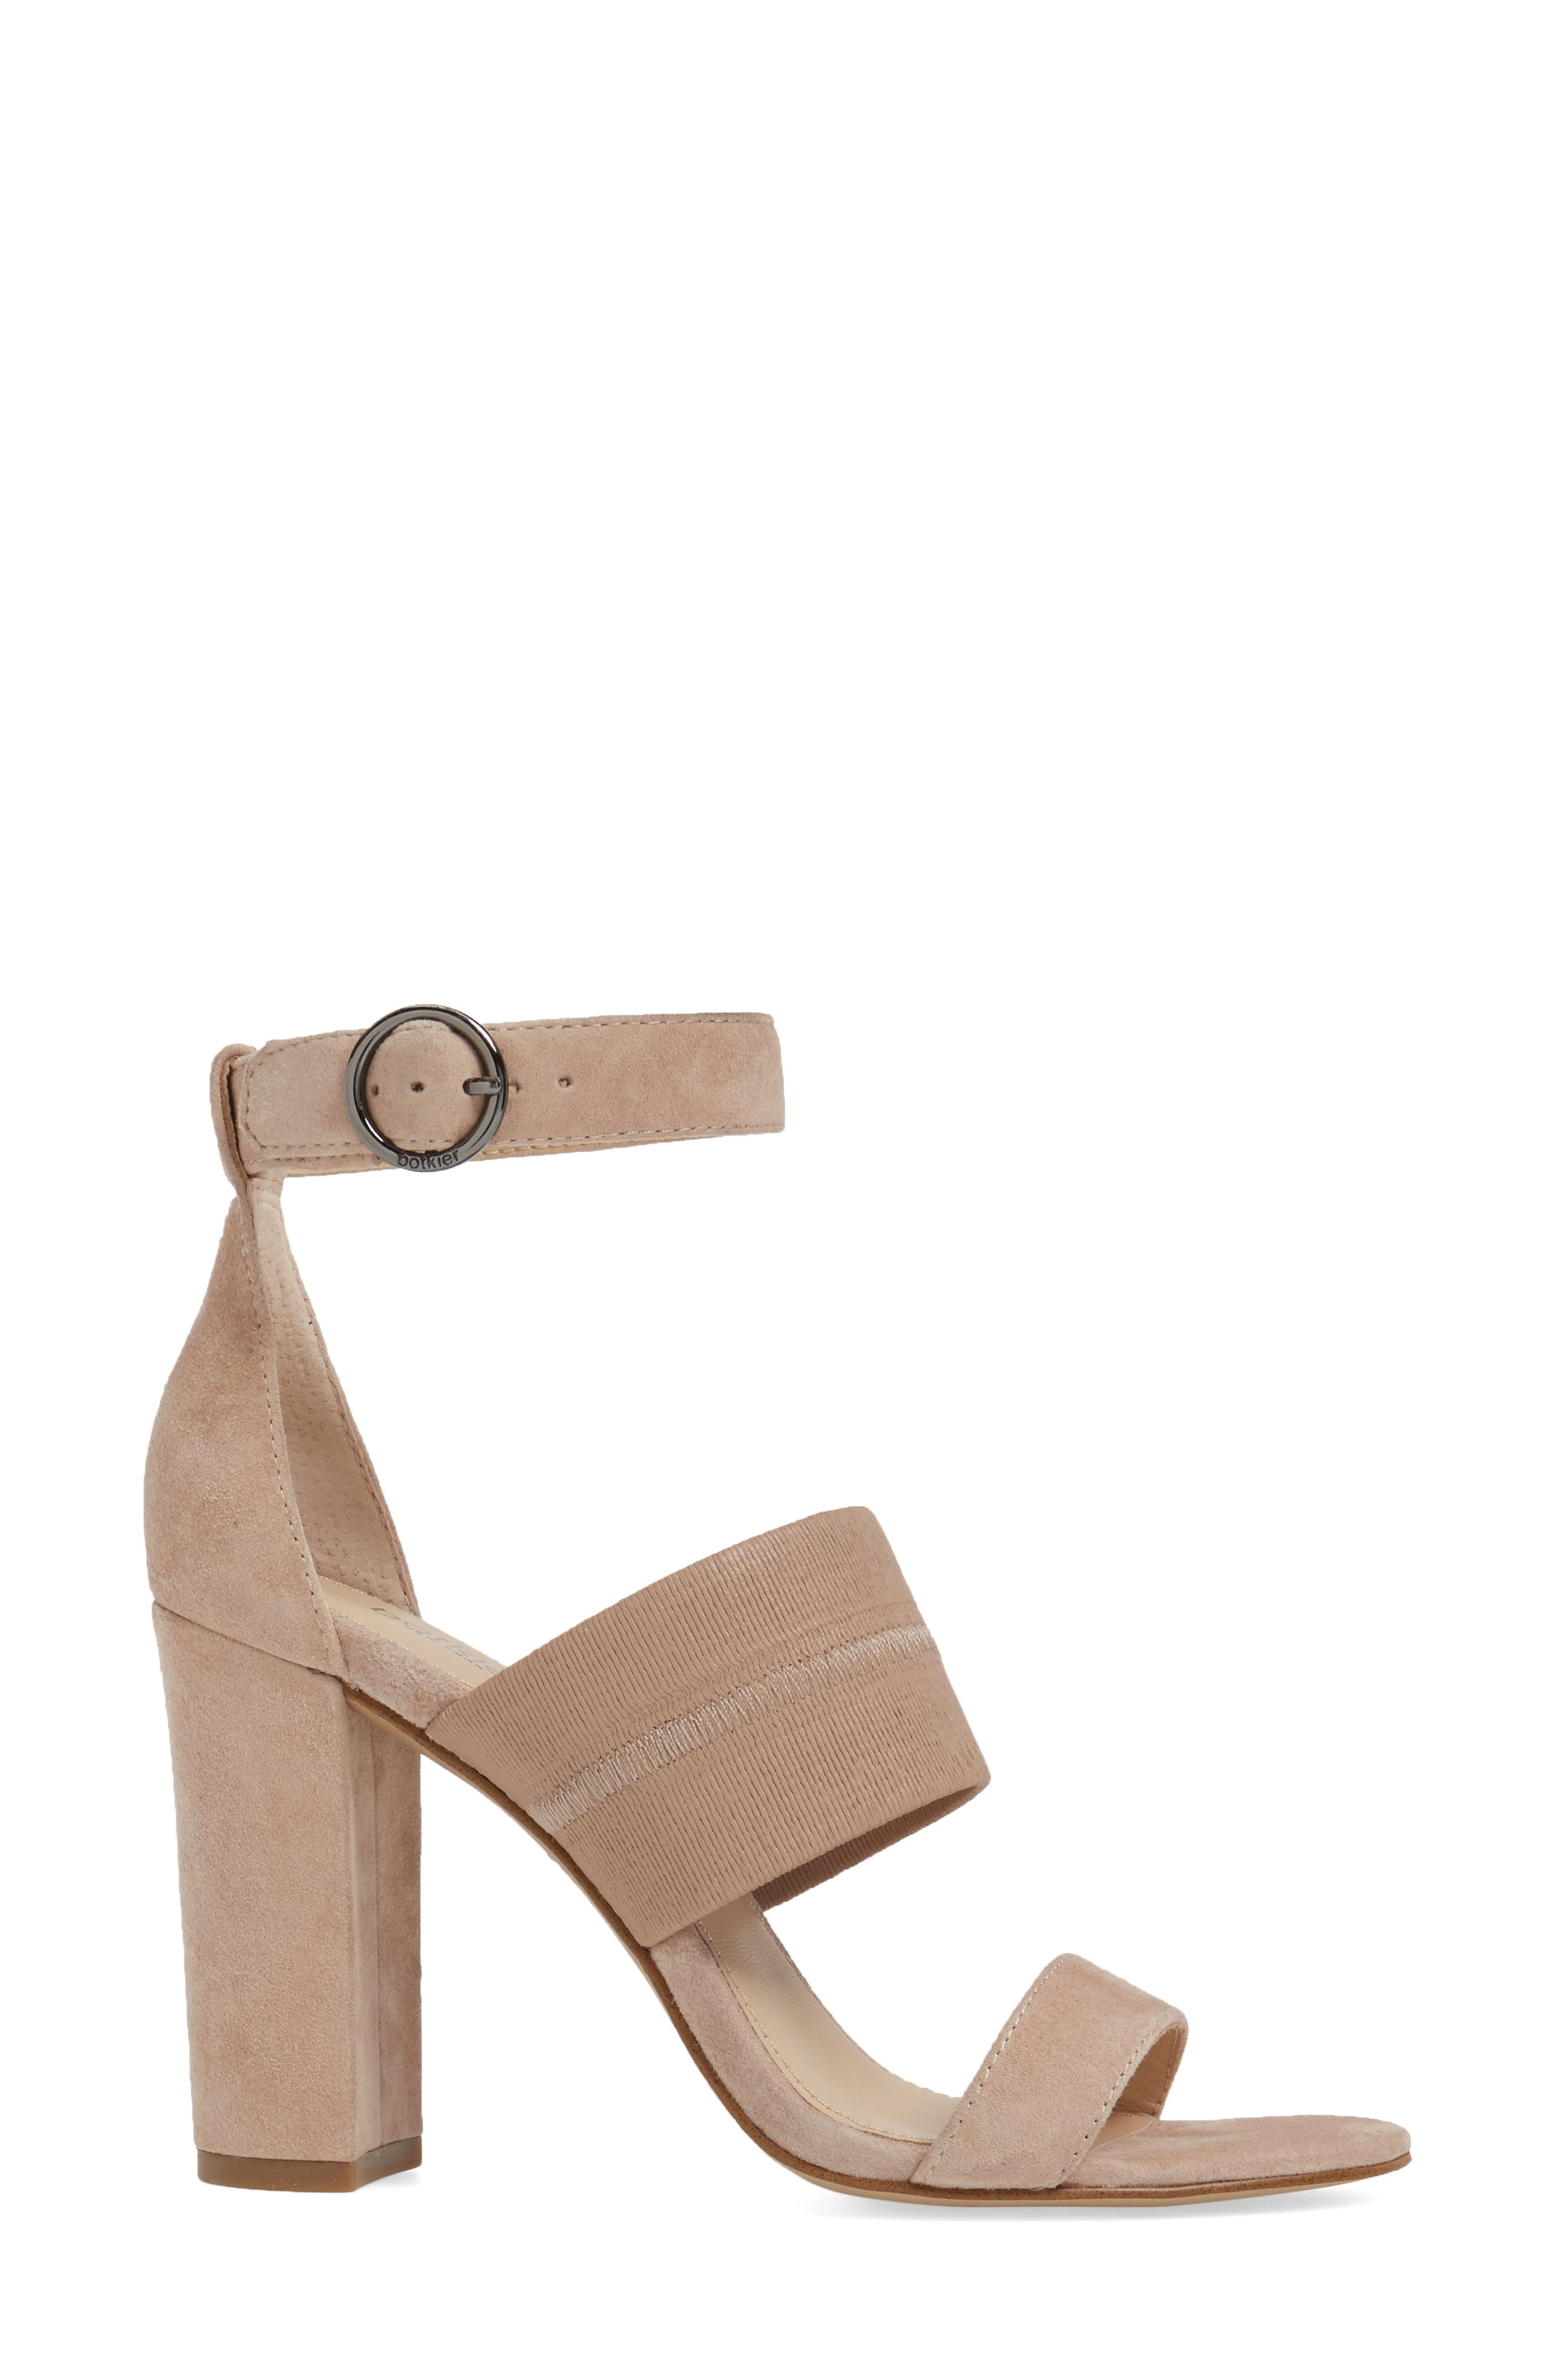 Alternate Image 3  - Botkier Gisella Ankle Strap Sandal (Women)